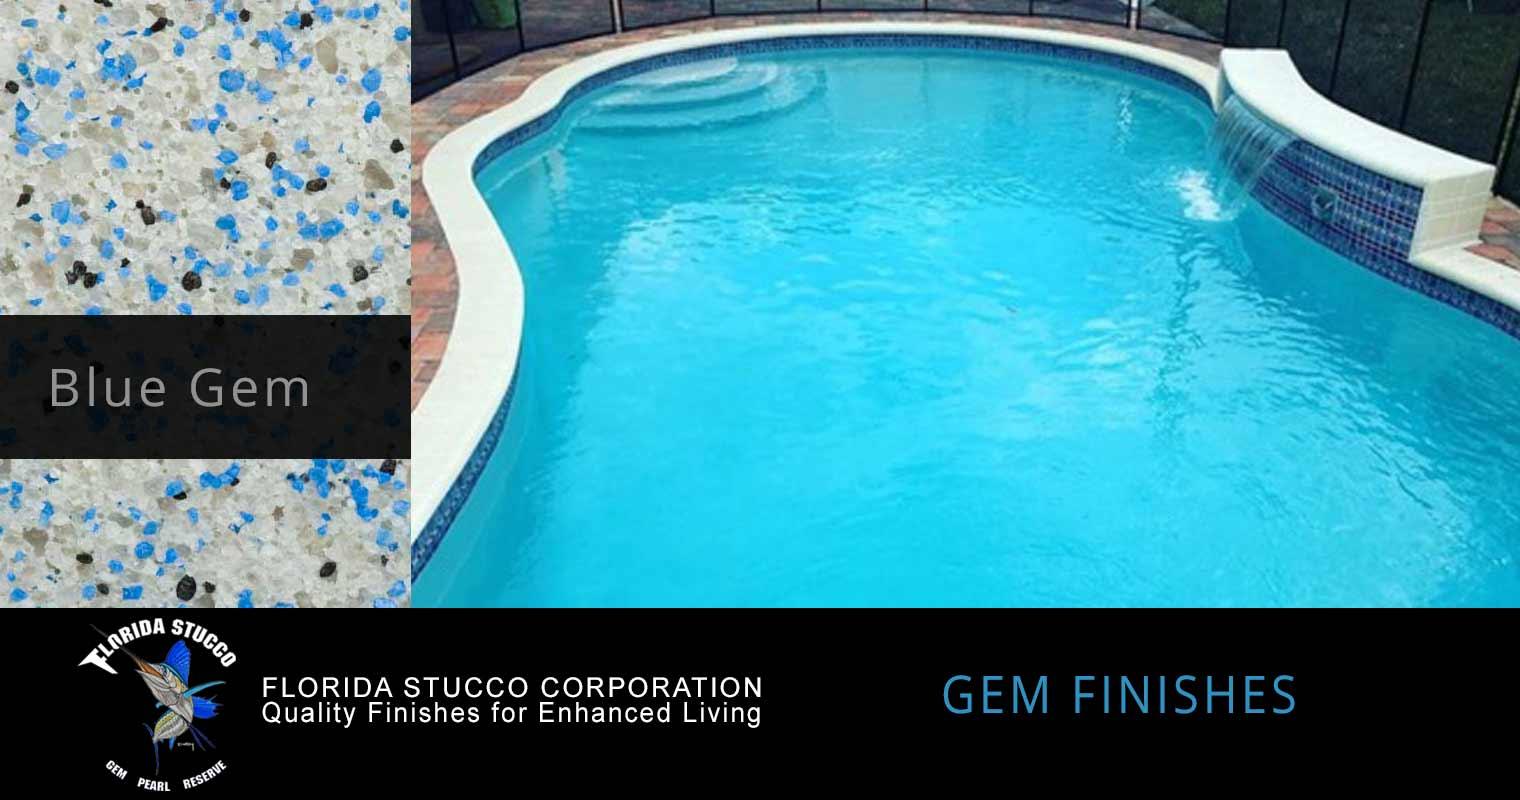 Florida Stucco - Blue Gem Plastering Finish Pool Sample 2